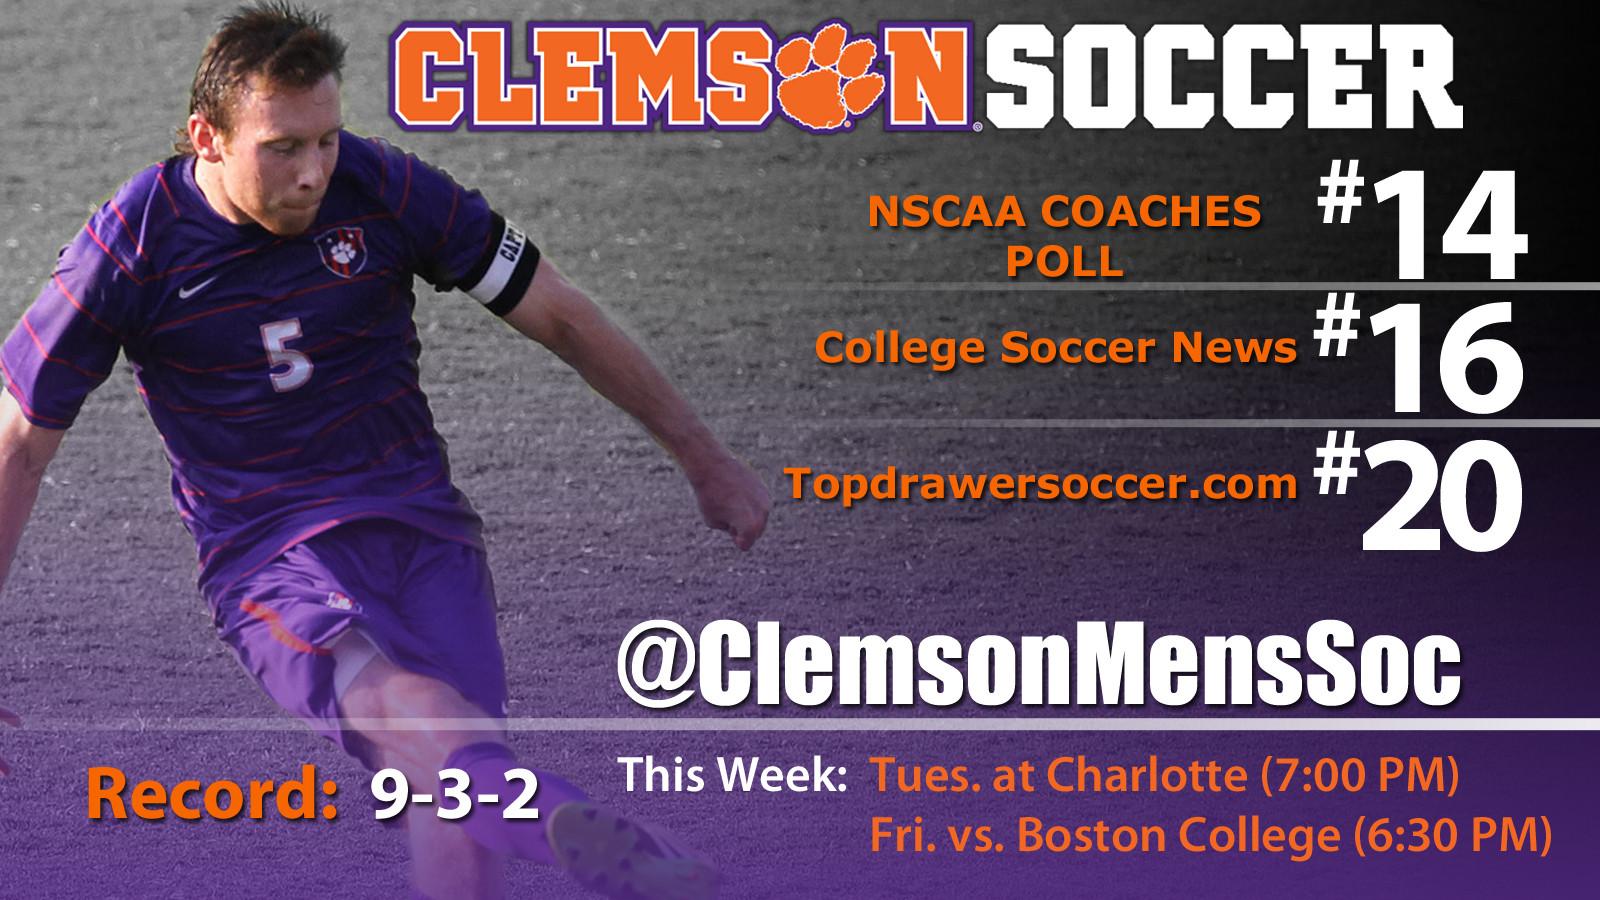 Clemson Men?s Soccer Ranked in Nation?s Top 25